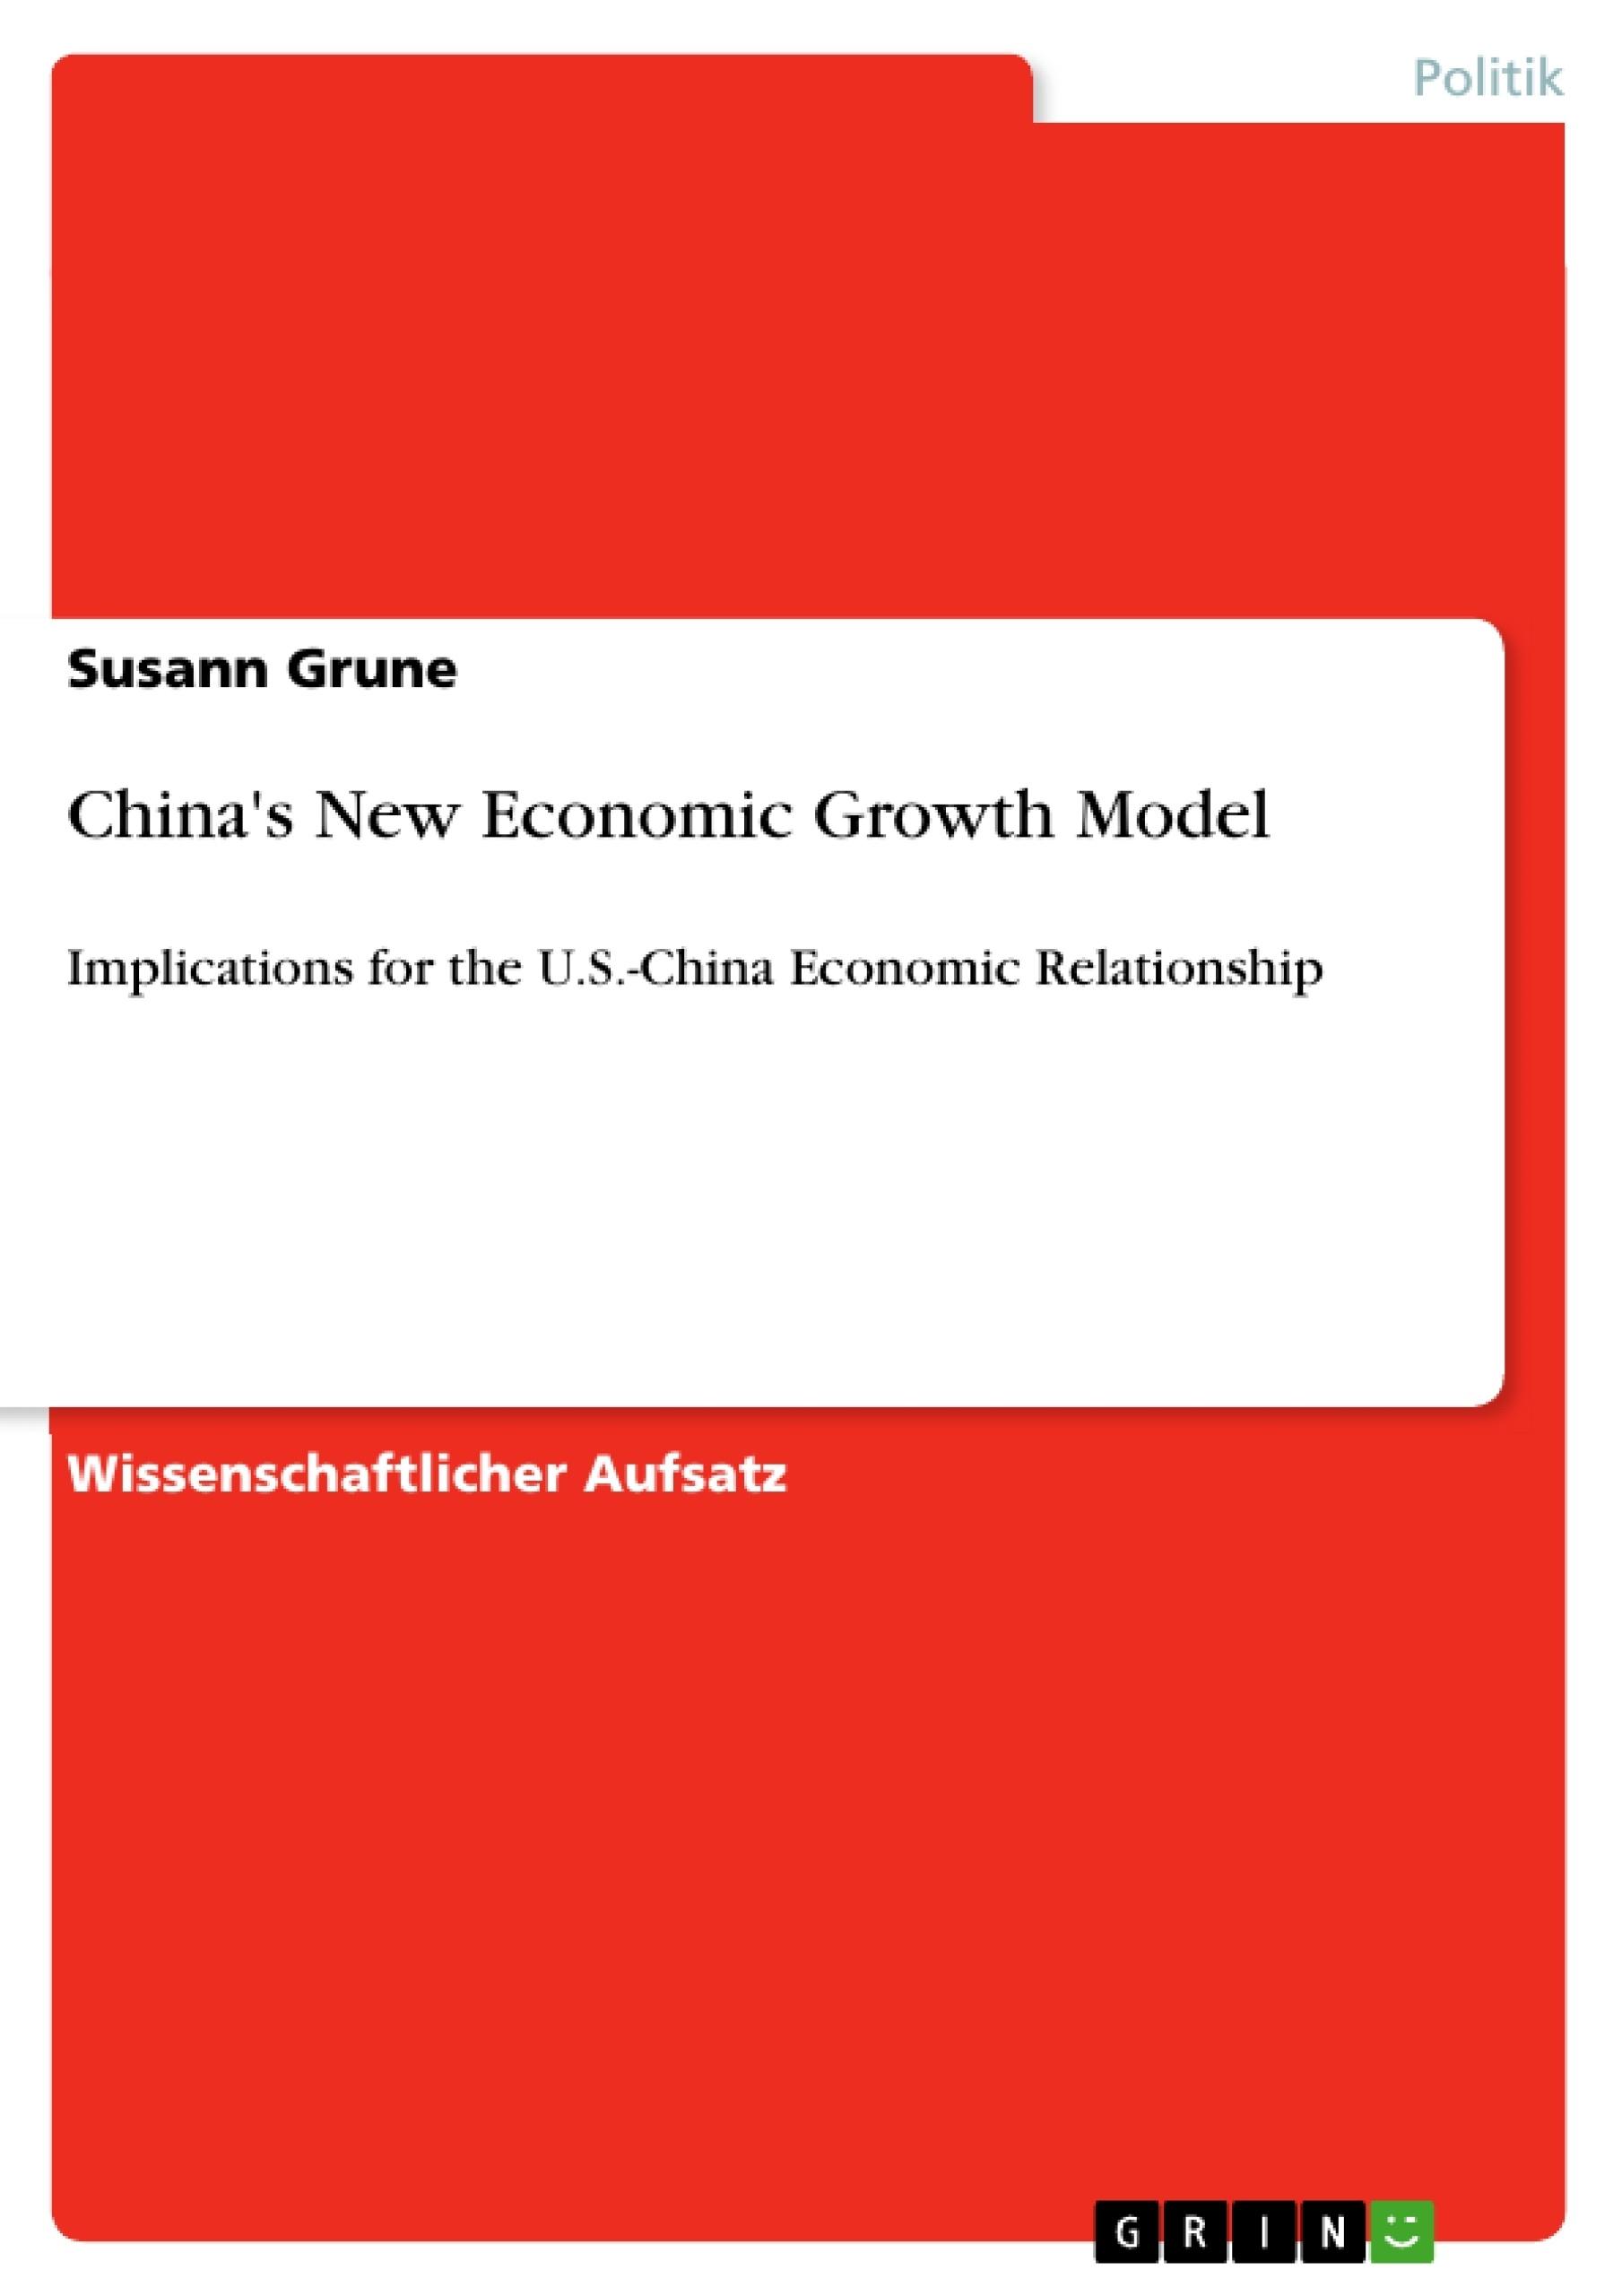 Titel: China's New Economic Growth Model